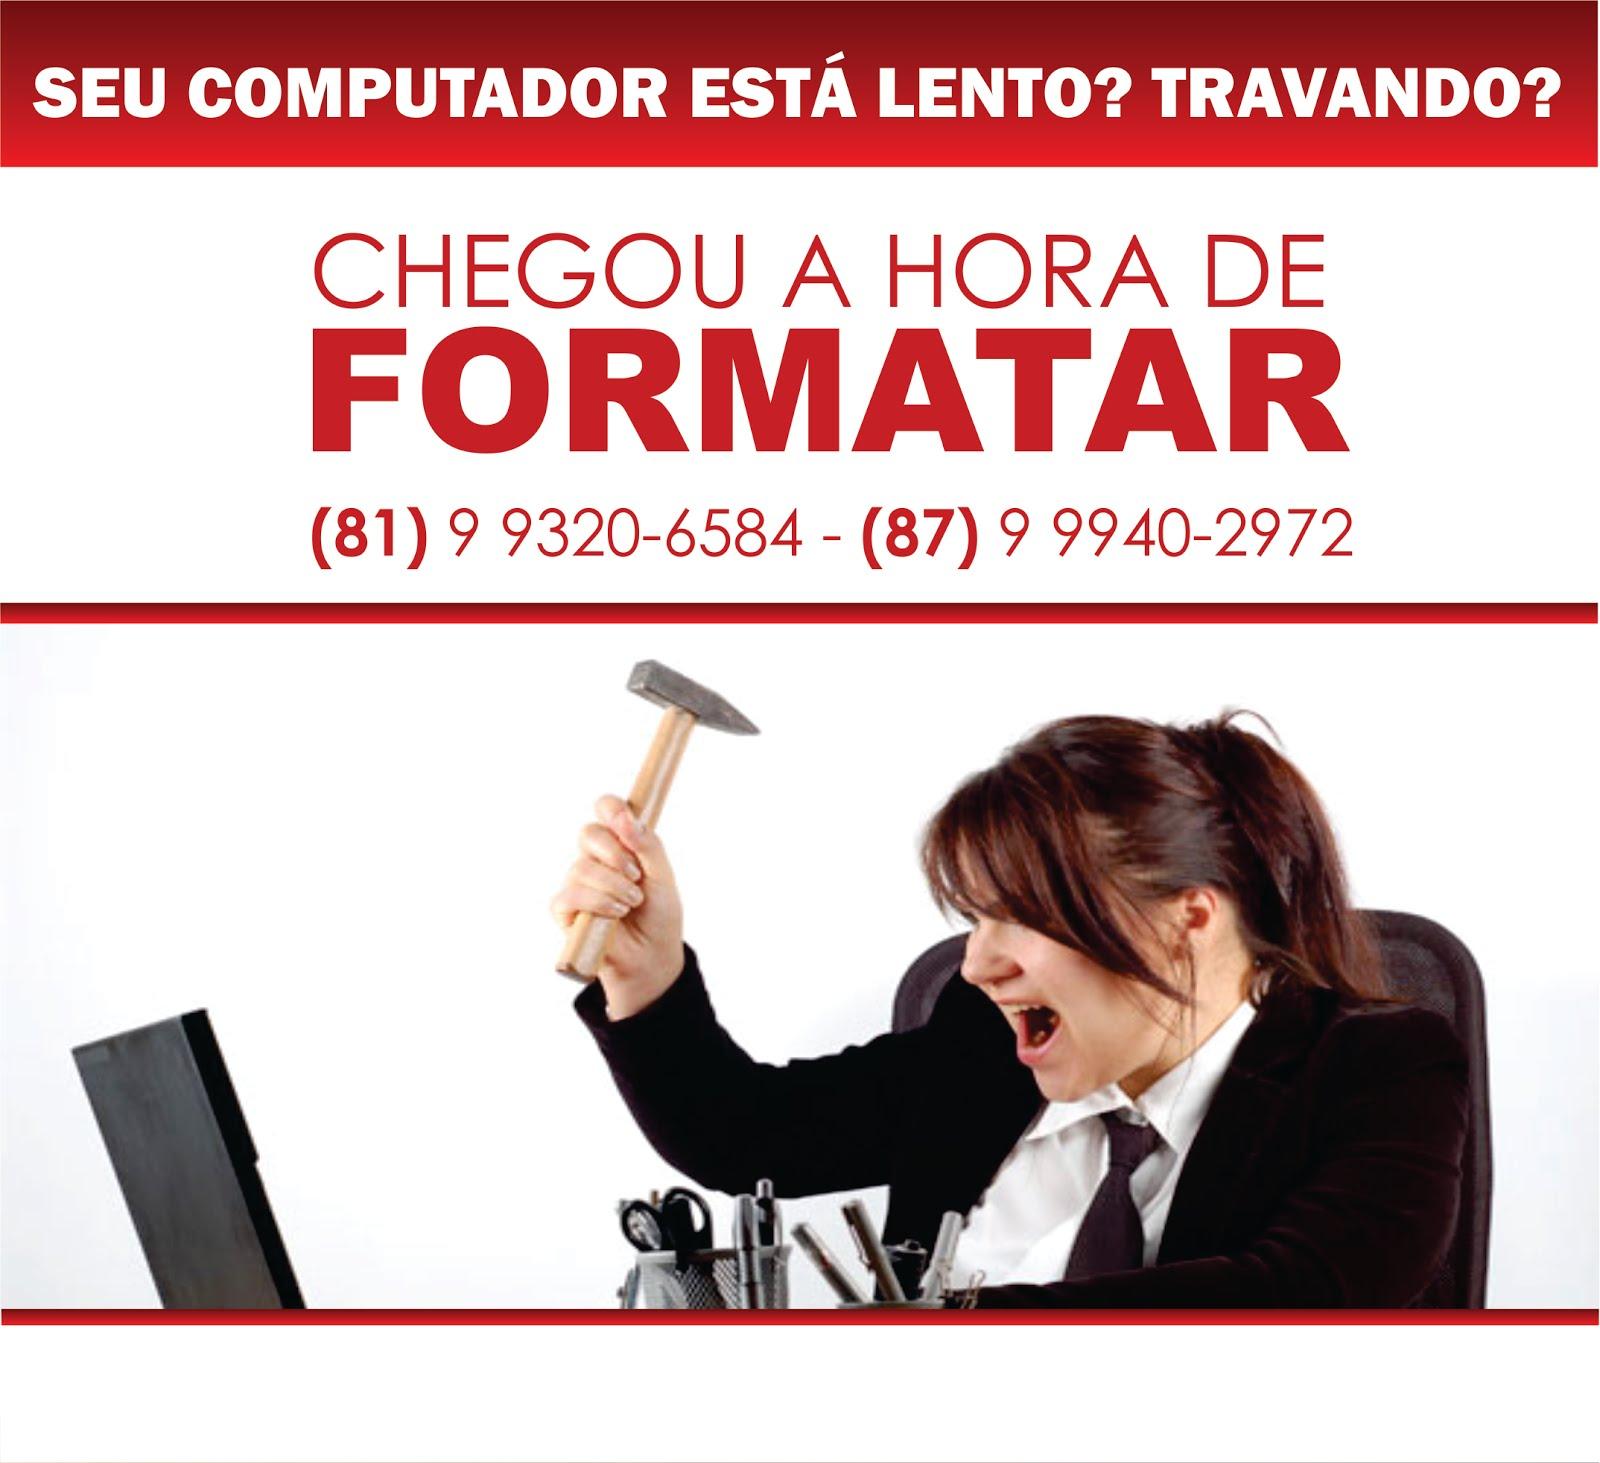 COMPUTADOR LENTO? CHEGOU A HORA DE FORMATAR